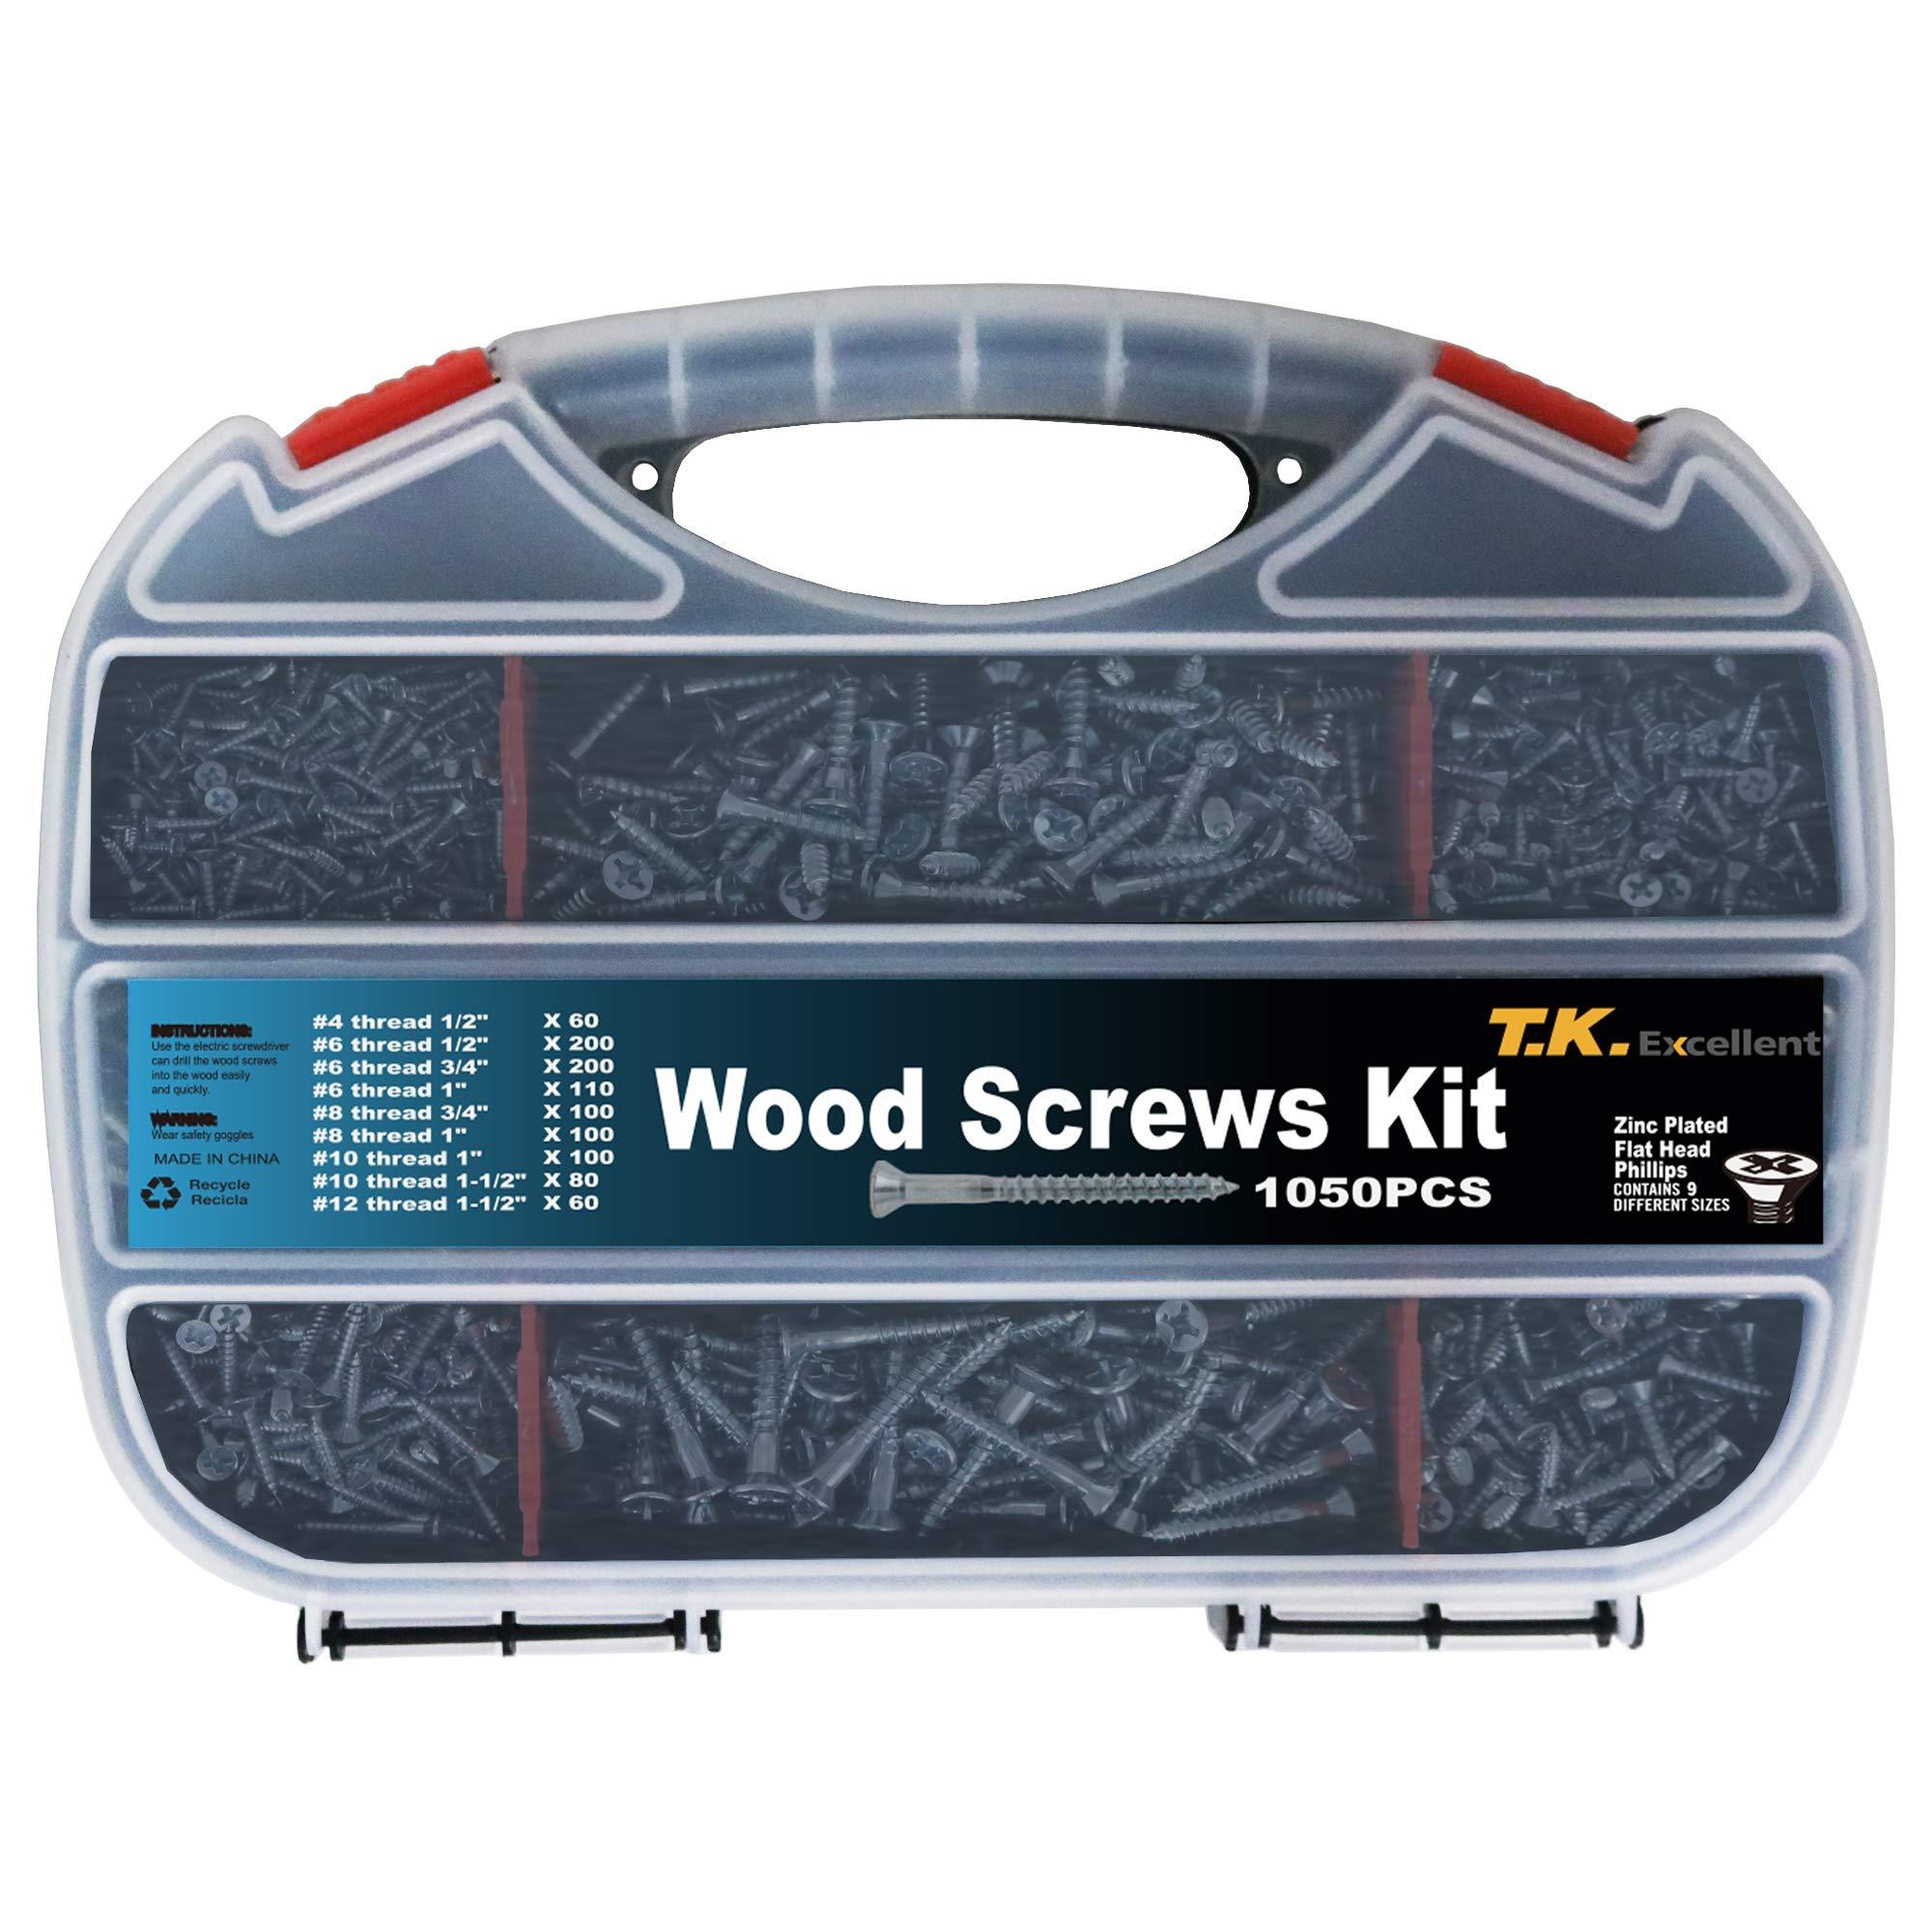 T.K.Excellent Wood Screw Phillips Flat Head #4#6#8#10#12 Screws Assortment Kit,1050 Pcs